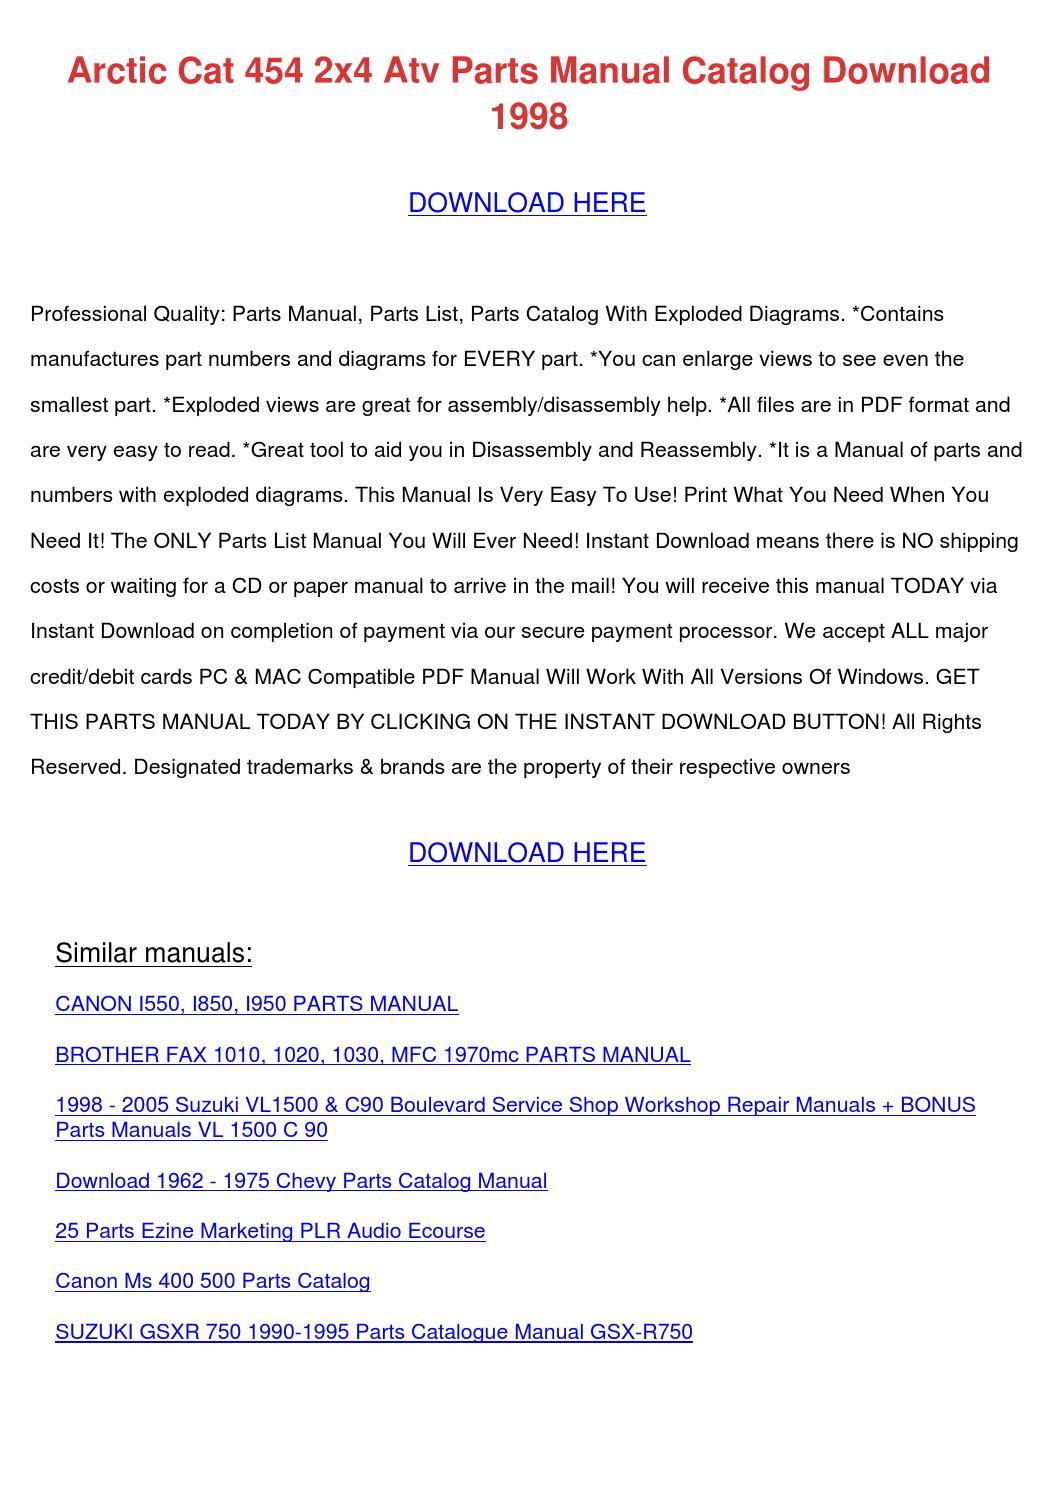 arctic cat 454 2x4 atv parts manual catalog d by harleyfreeland issuu